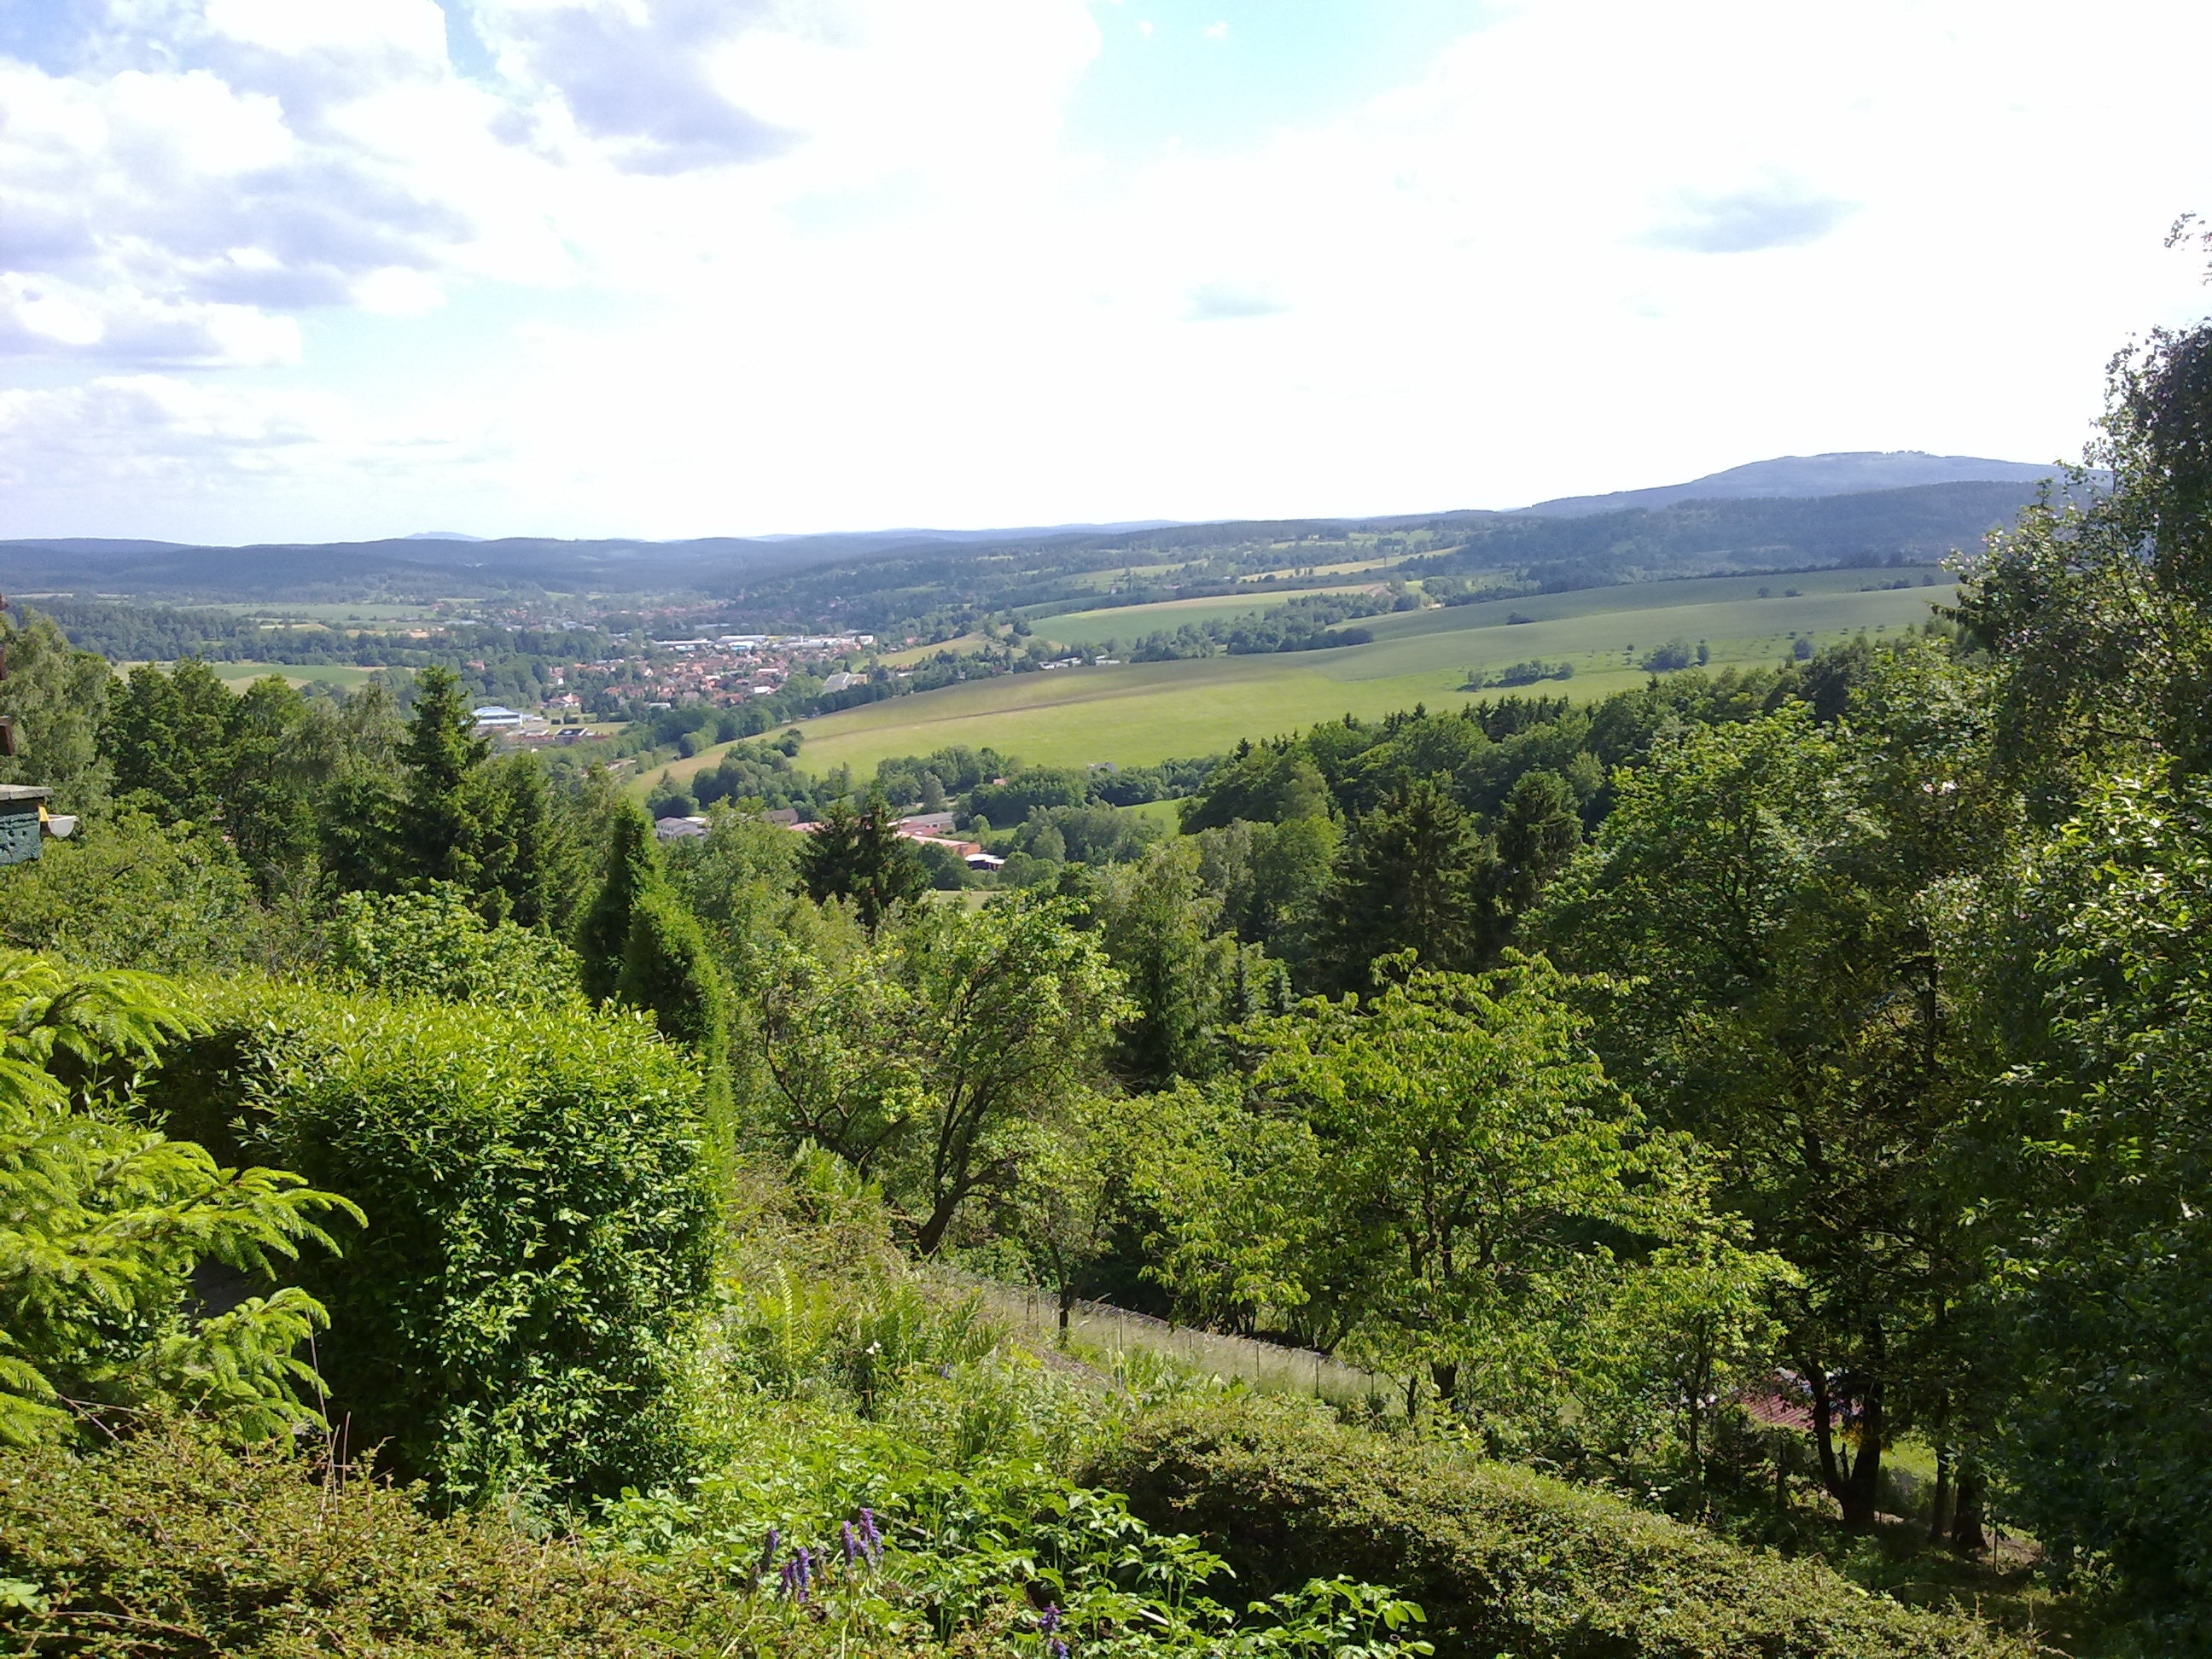 Steinbach-Hallenberg, Thuringia, Germany